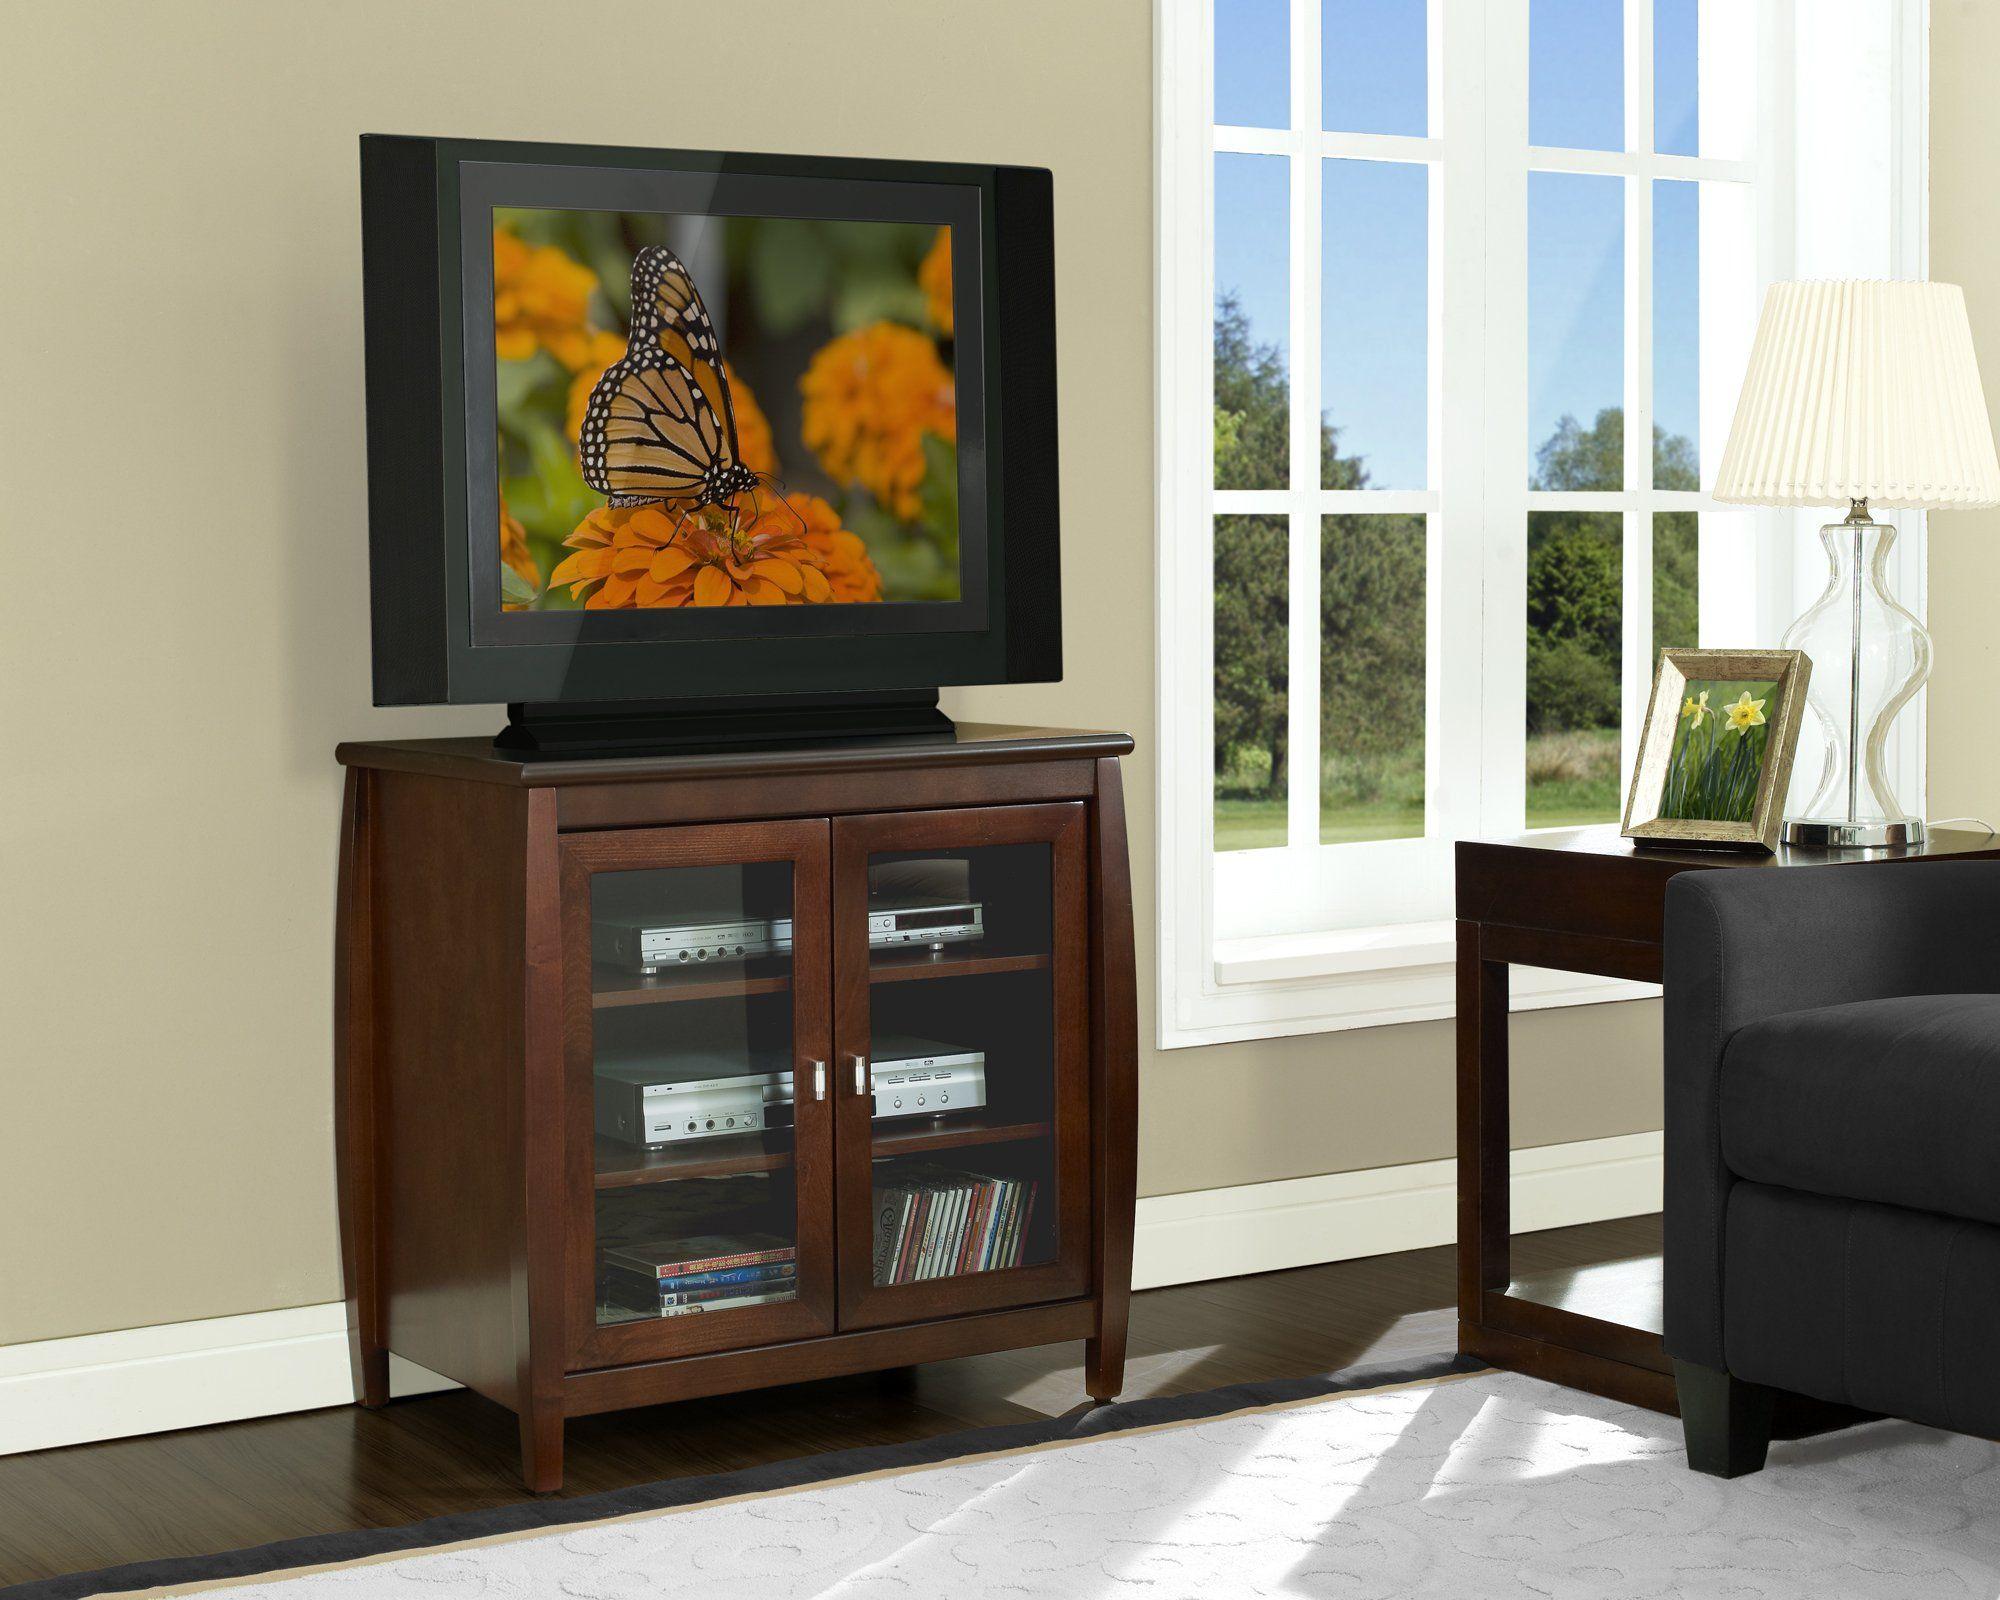 Amazon Com Techcraft Swd30 30 Inch Wide Flat Panel Tv Hi Boy Walnut Furniture Decor Flat Panel Tv Home Furniture